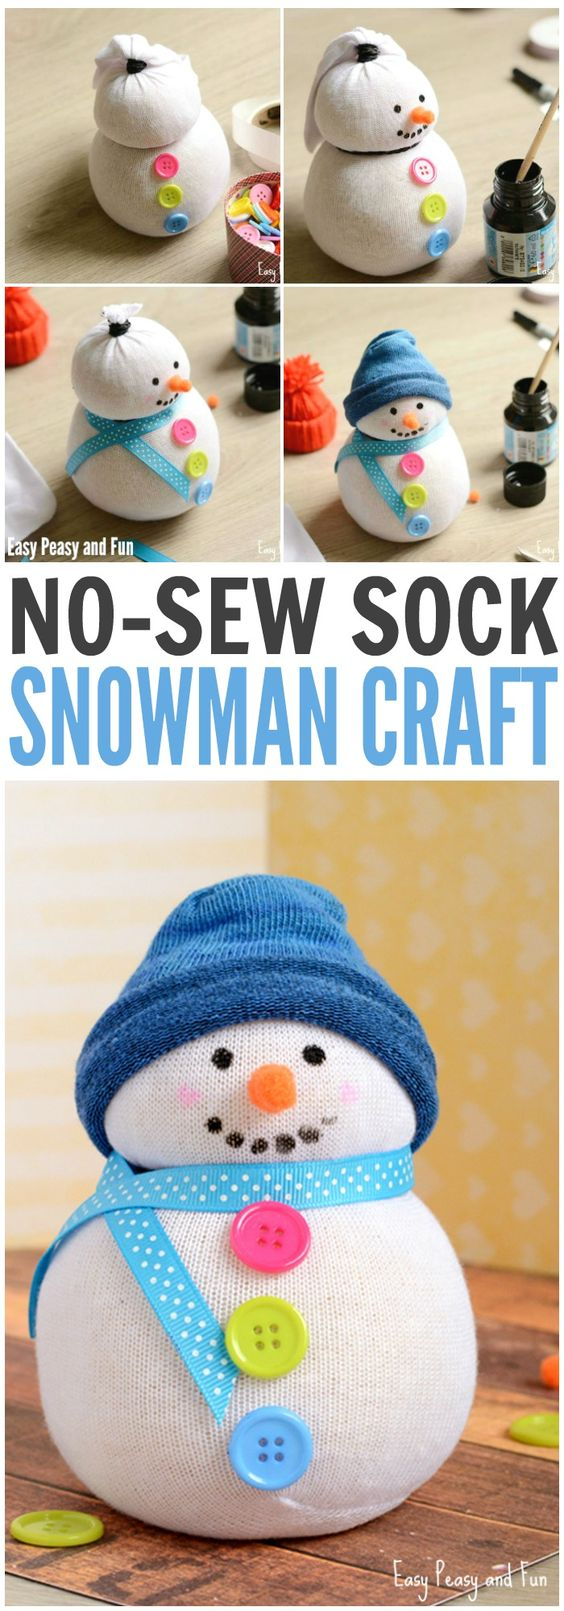 No-Sew Sock Snowman Craft.